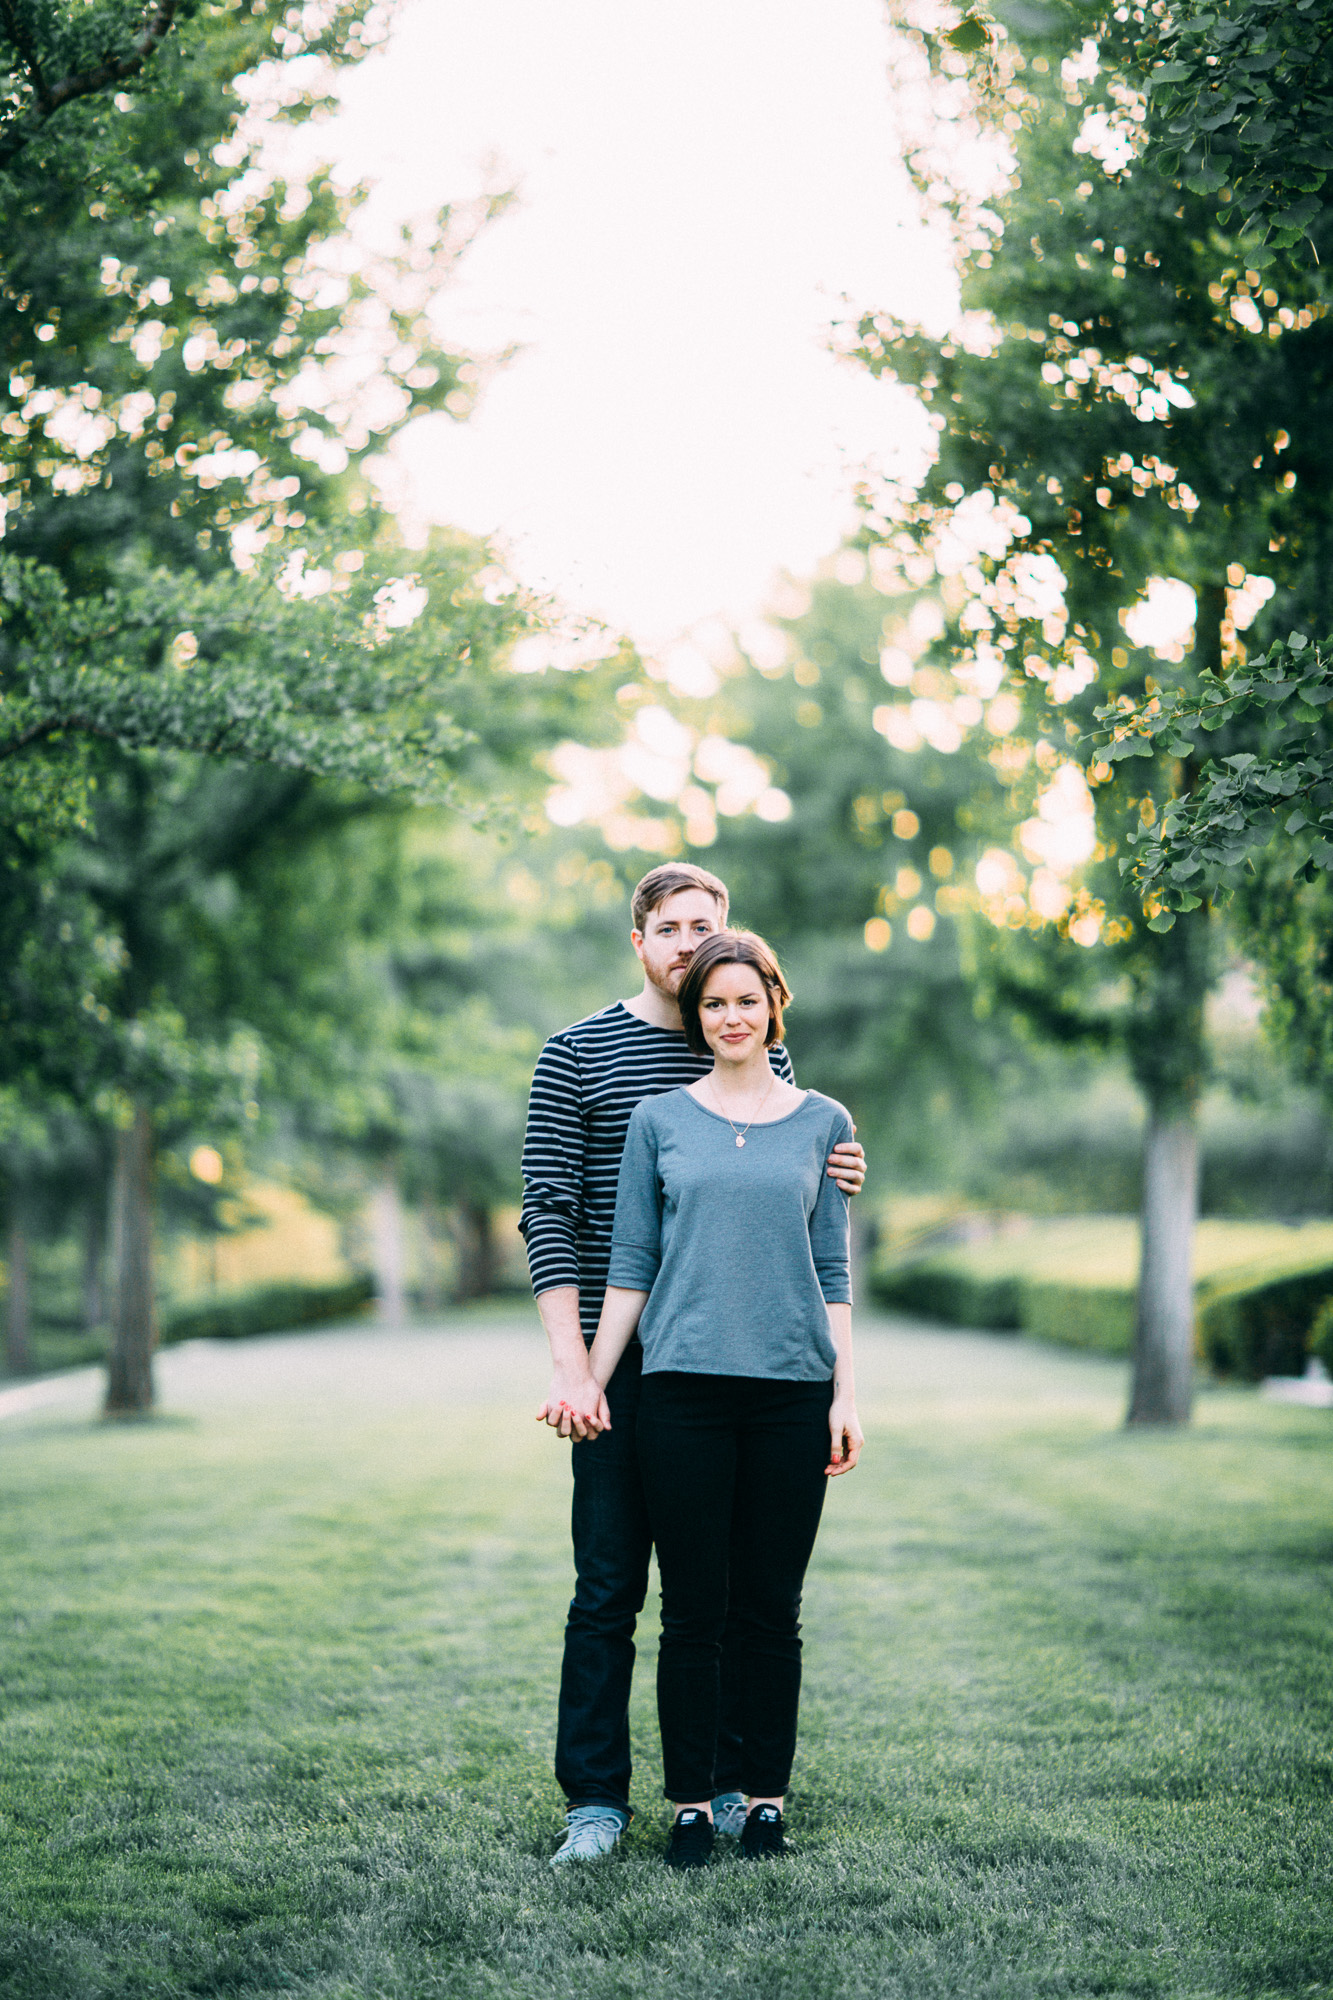 Brian Ide Kaley Tesdahl Engagement Portraits 10